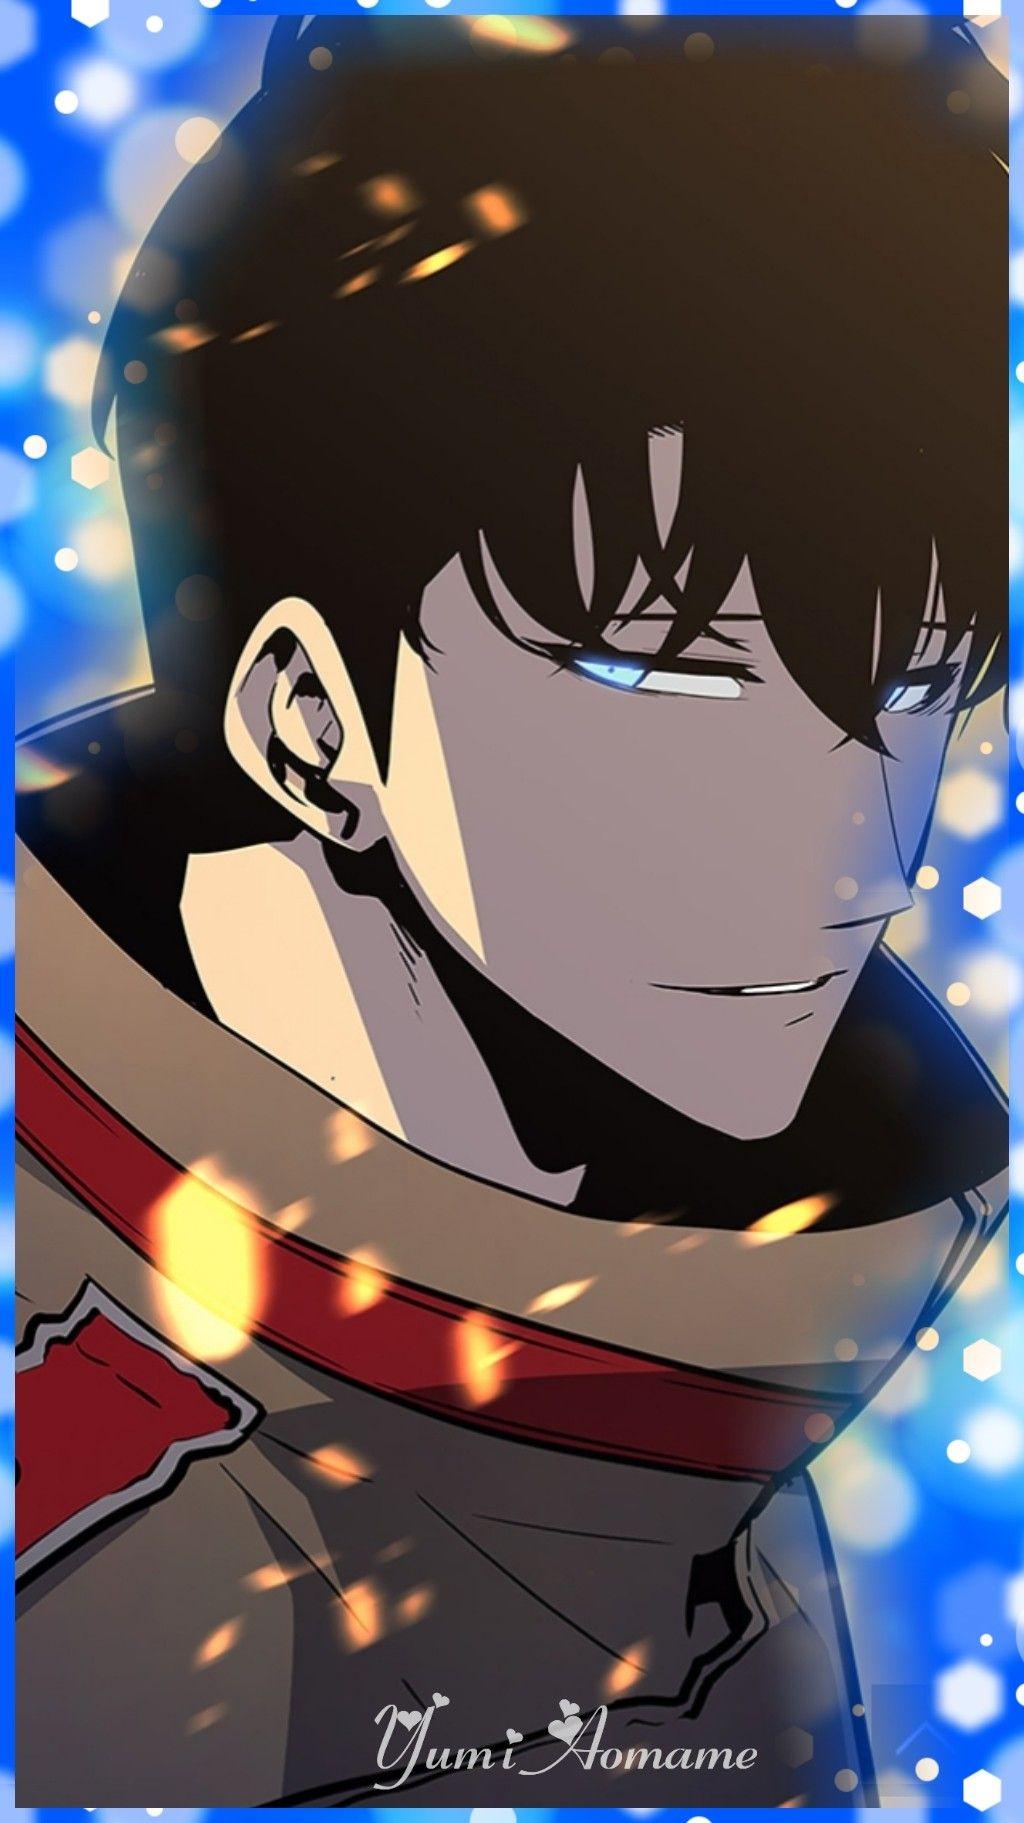 Pin by Yumi Aomame on Yumi's in 2020 Anime, Anime demon